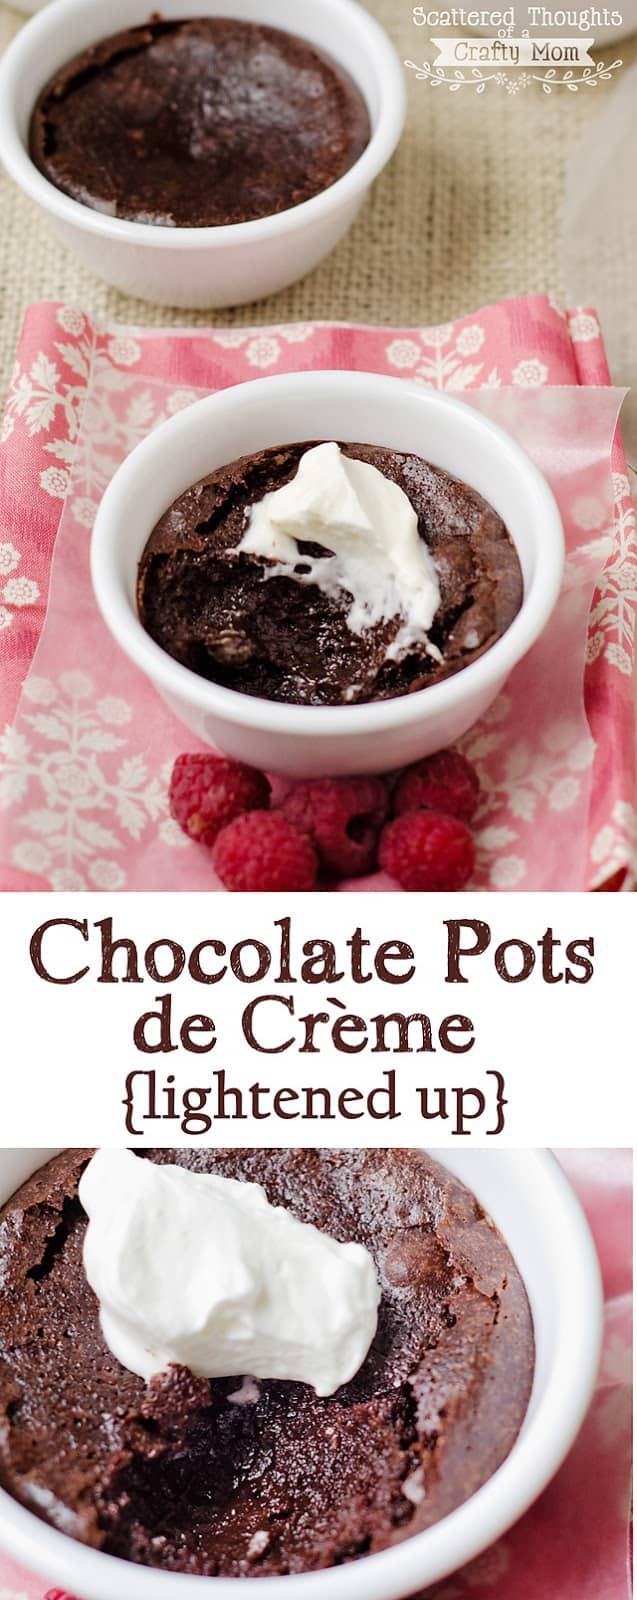 Chocolate Pots de Crème Recipe